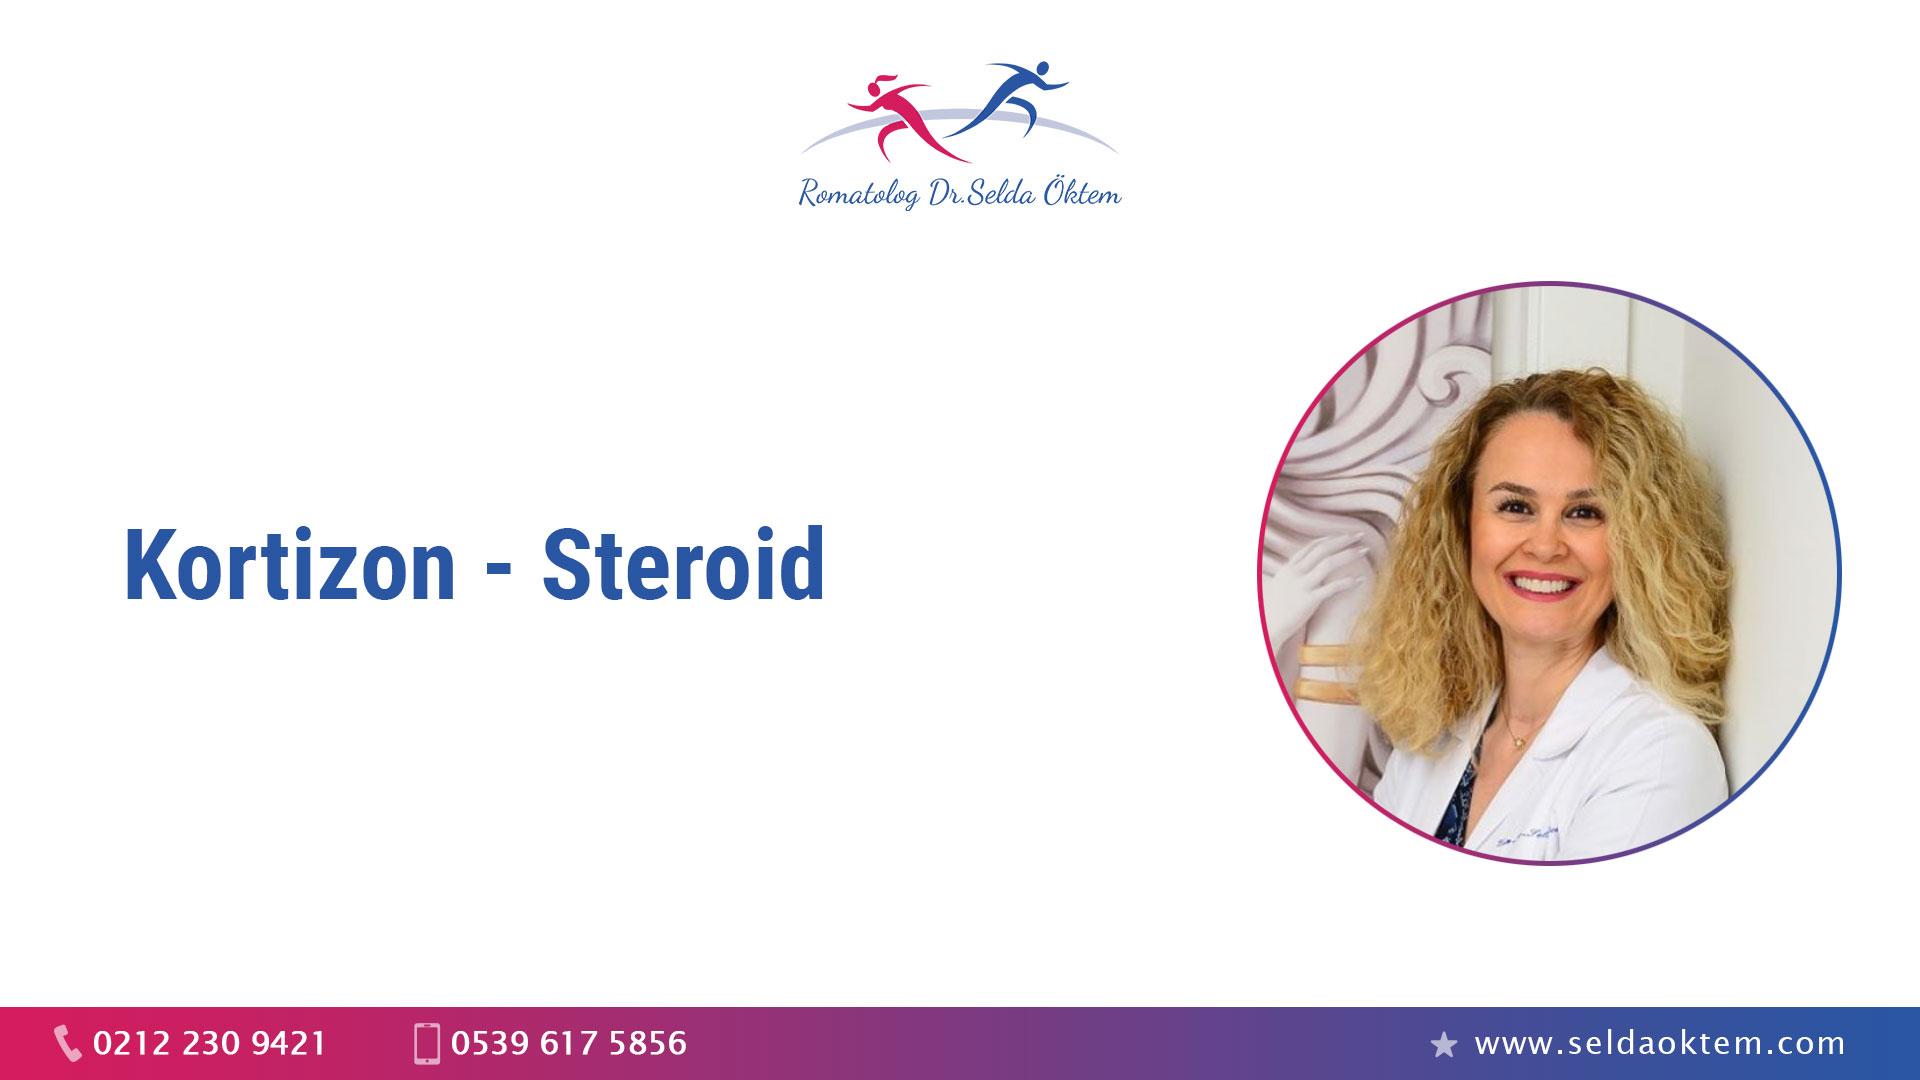 Kortizon - Steroid